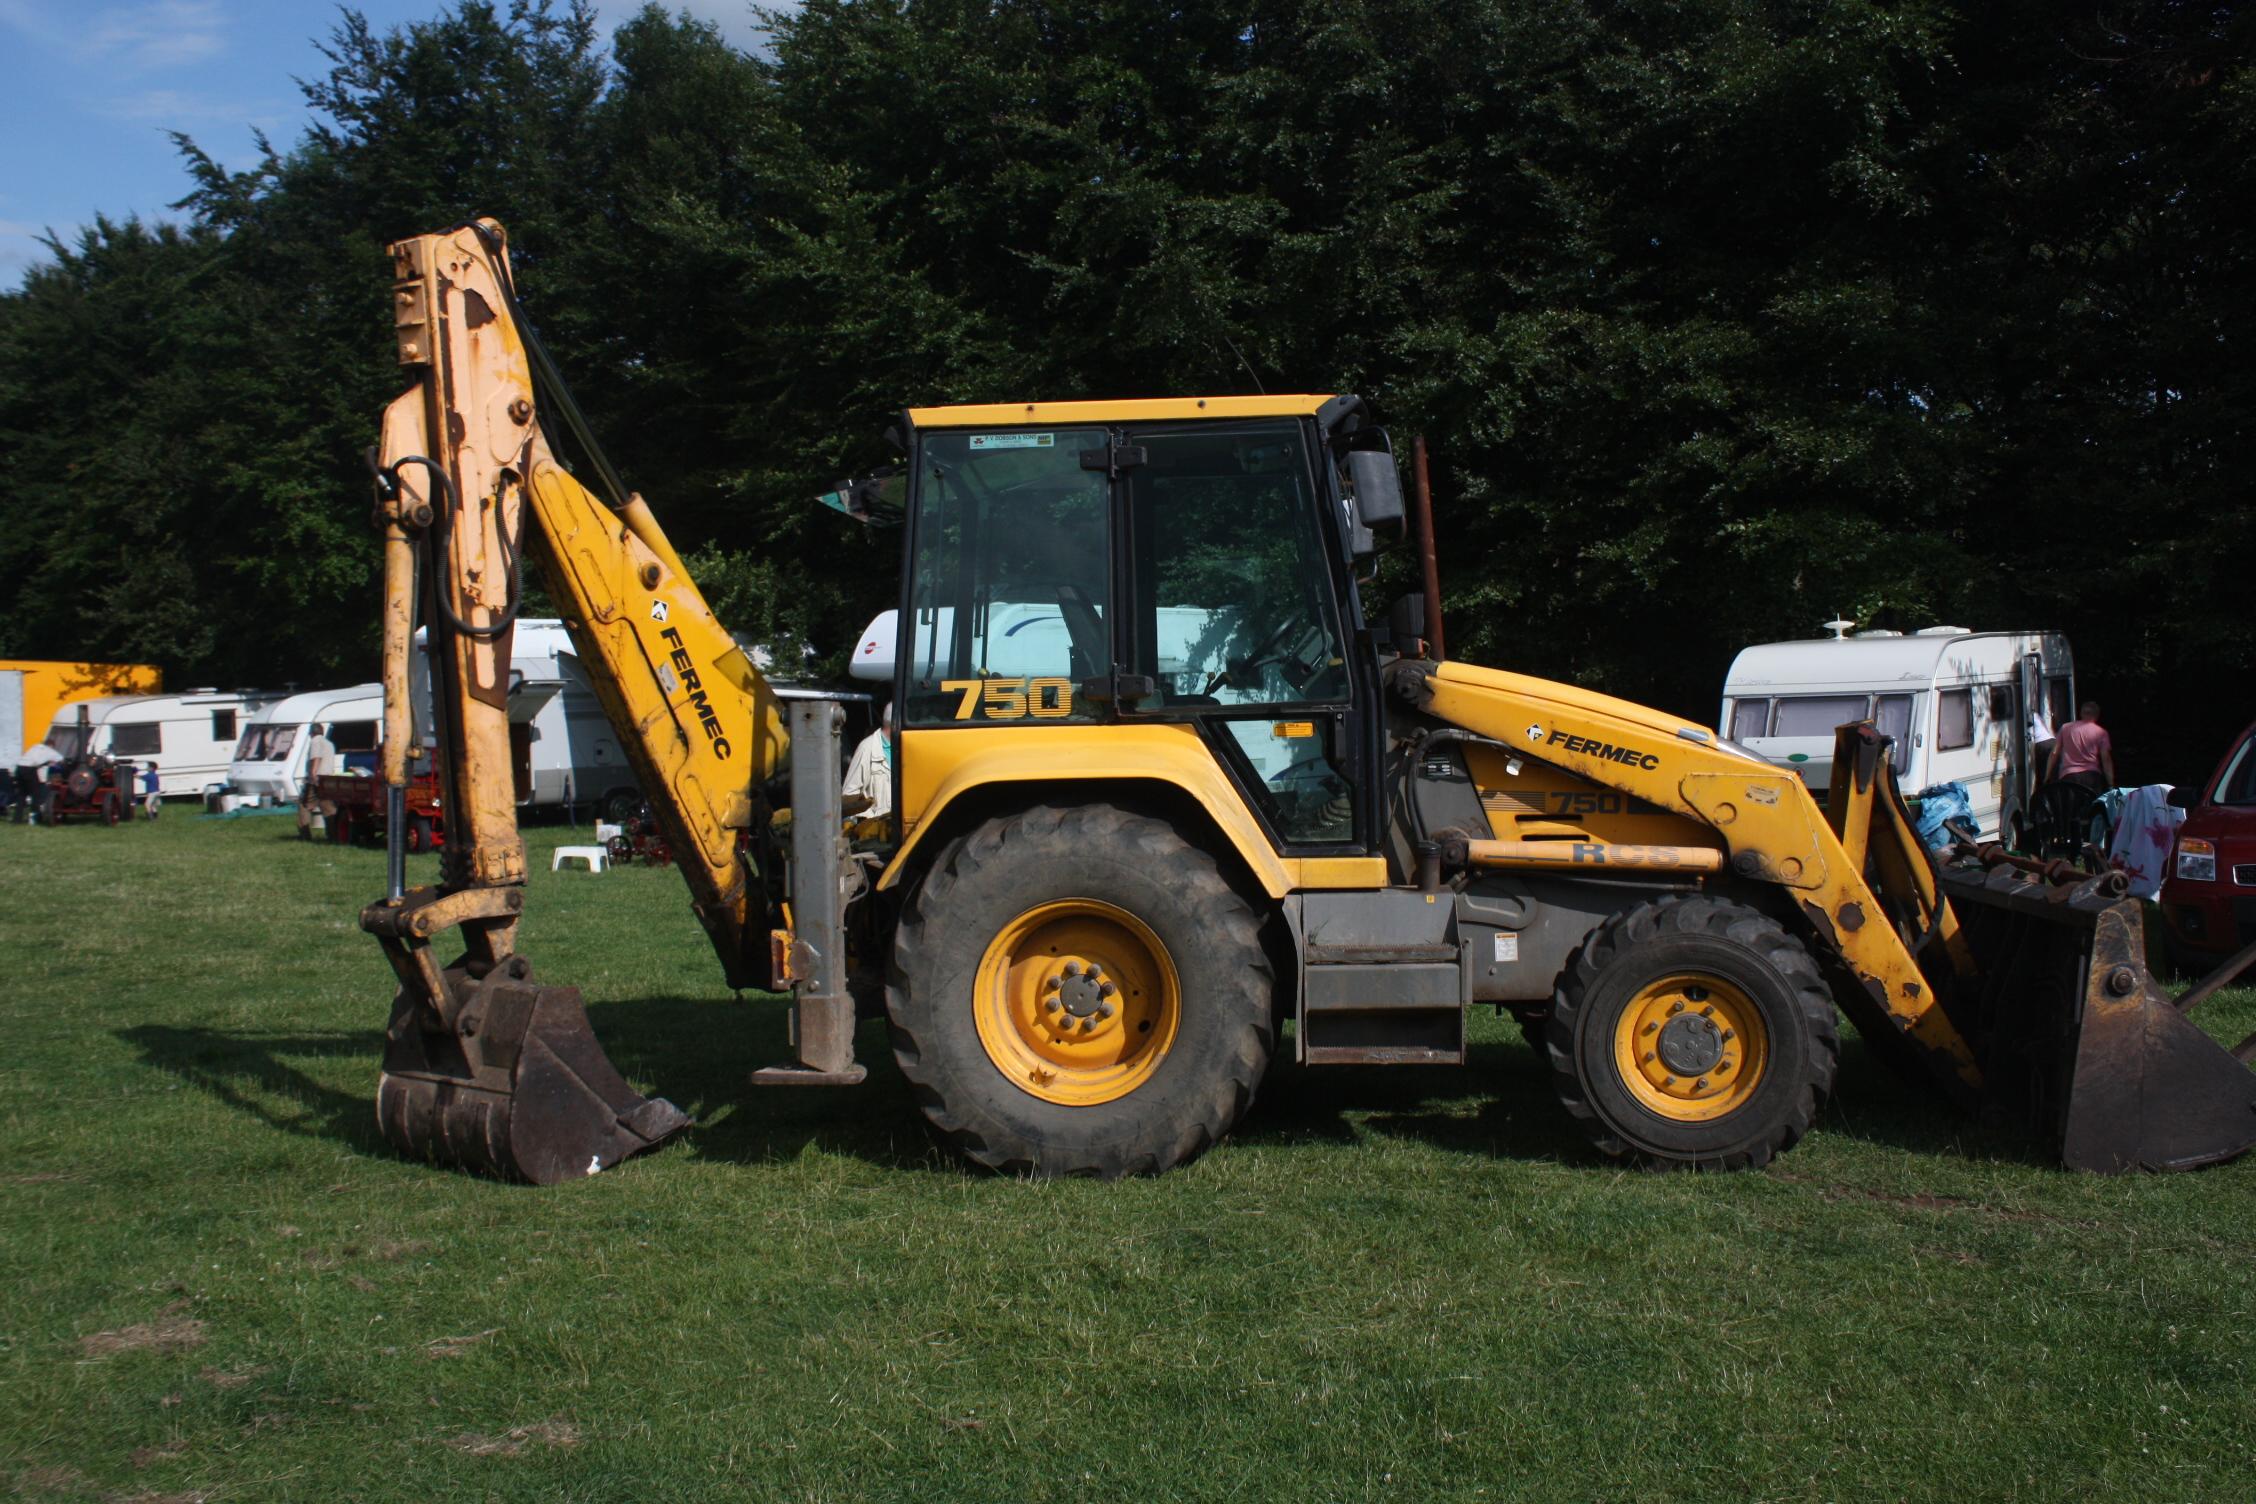 fermec tractor construction plant wiki fandom powered by wikia rh tractors wikia com